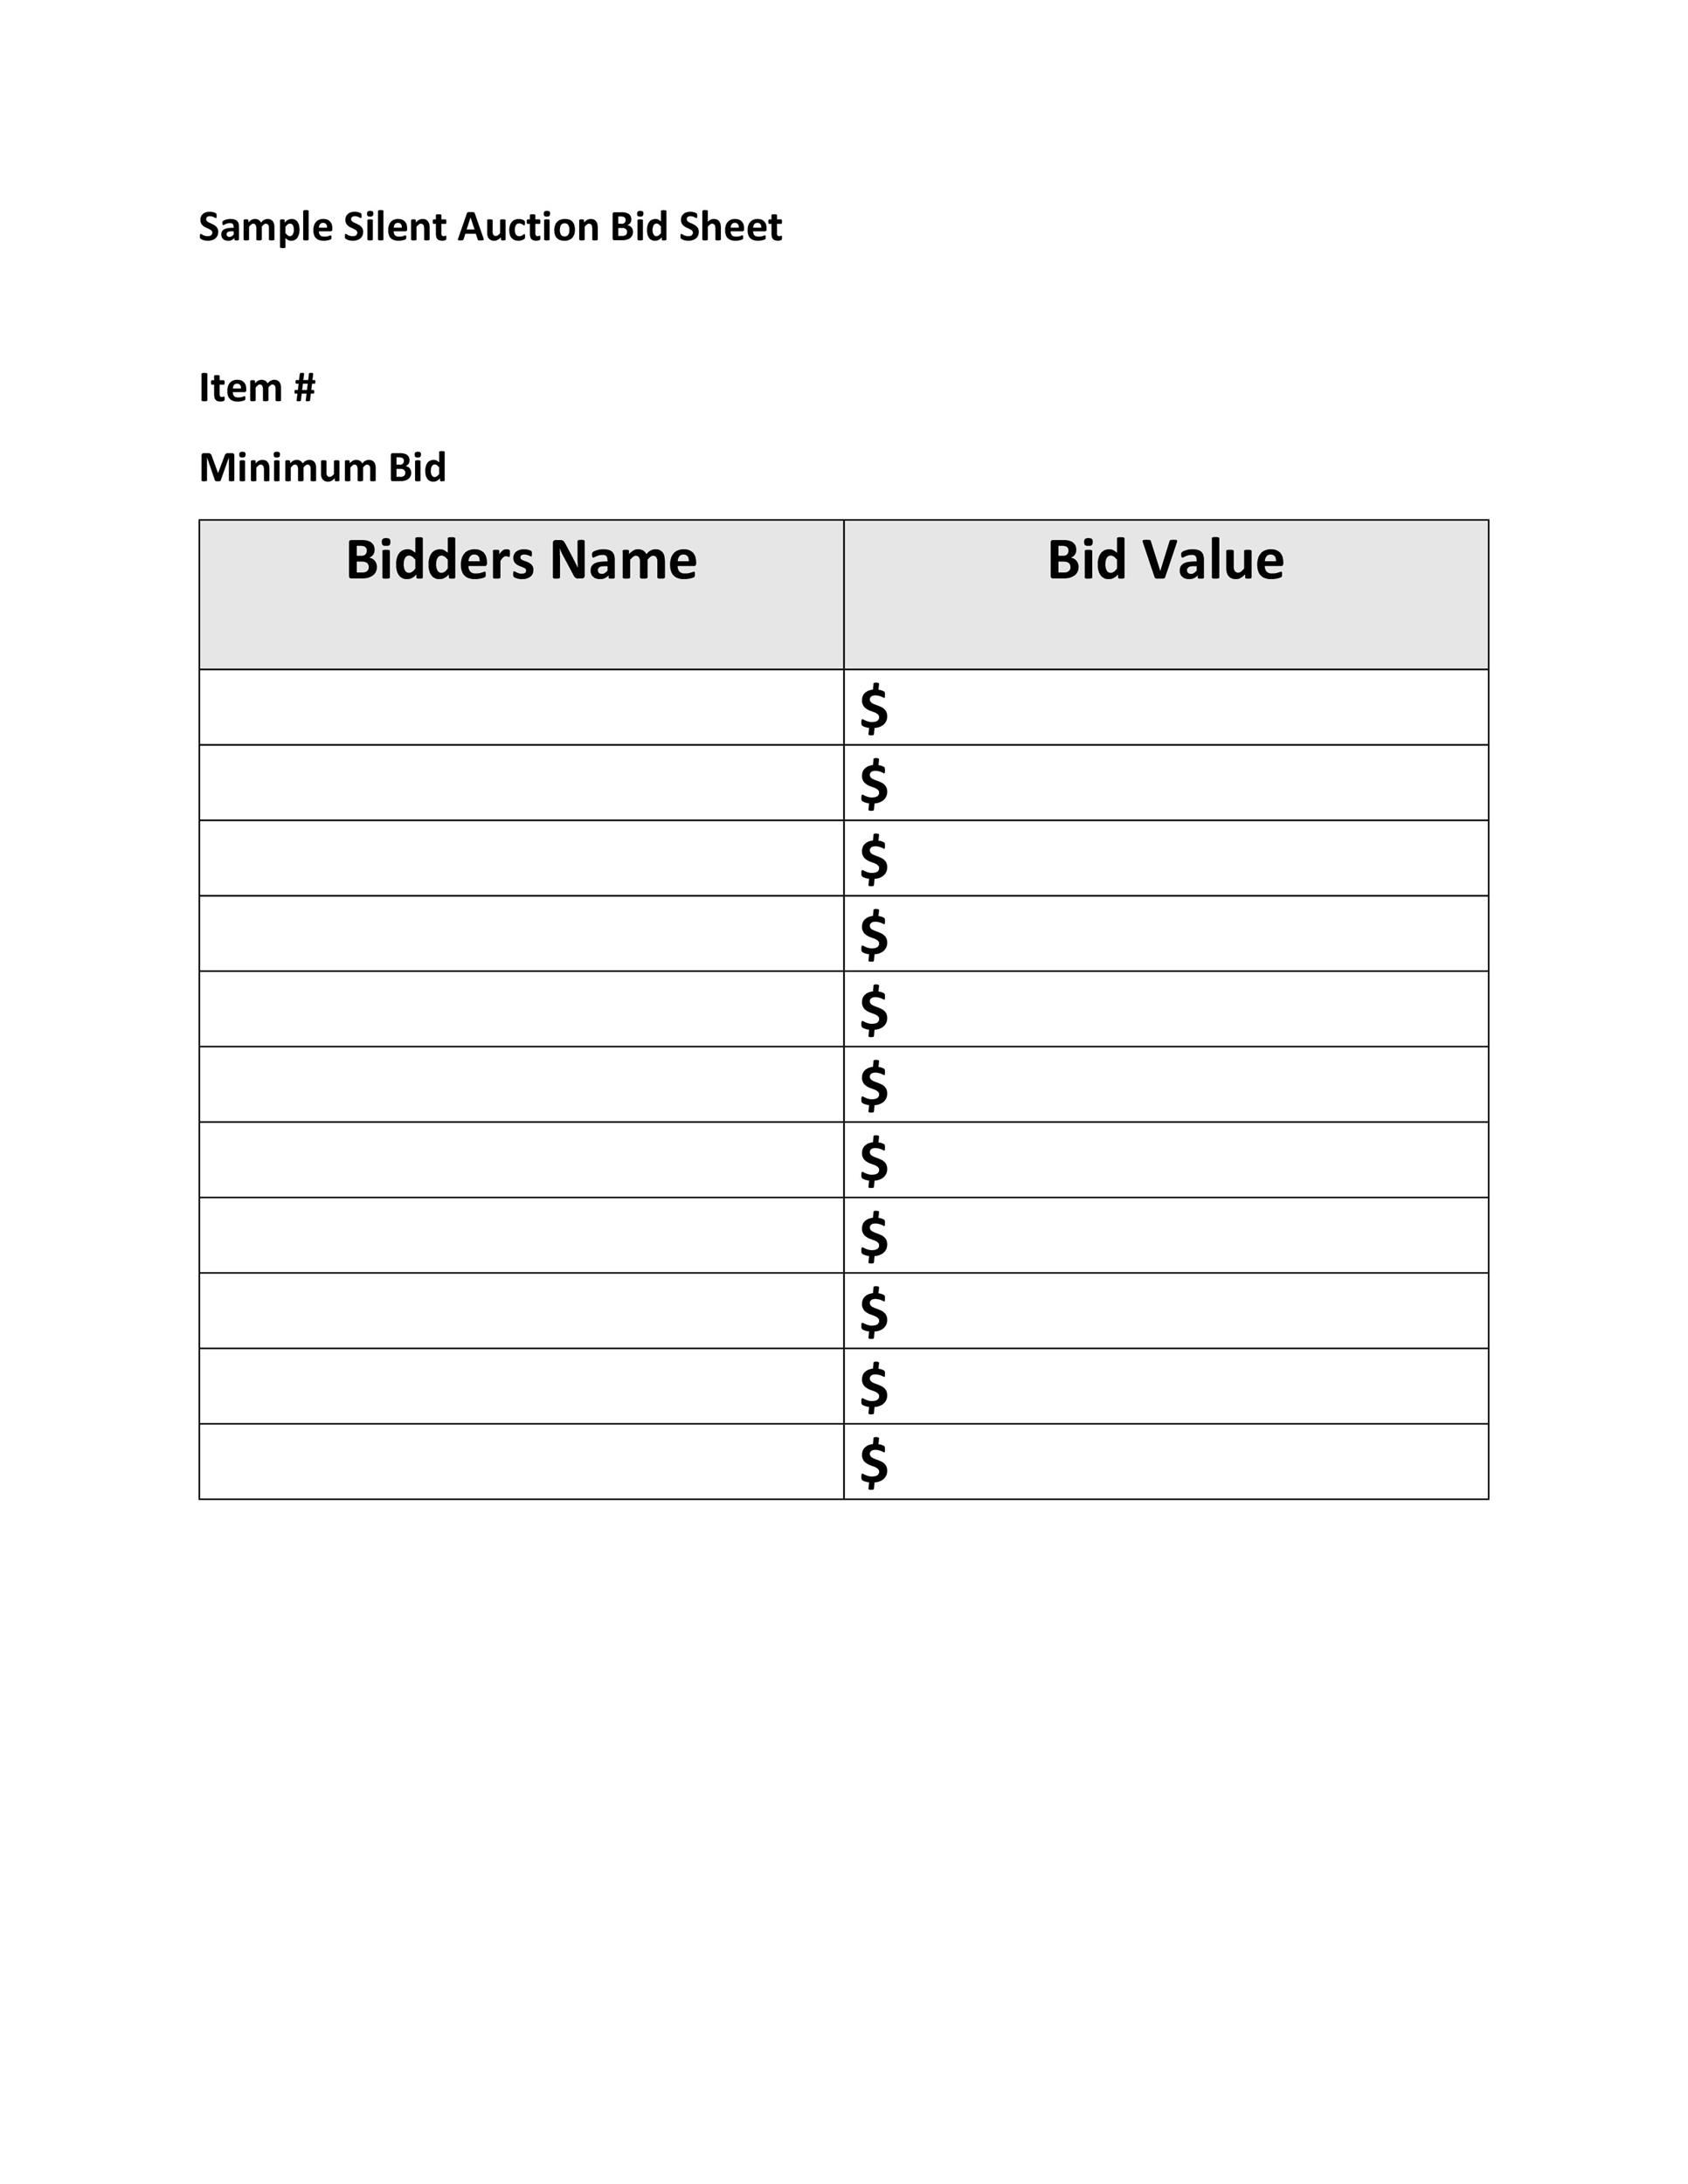 005 Unique Sample Silent Auction Bid Sheet Free  Printable Template DownloadFull